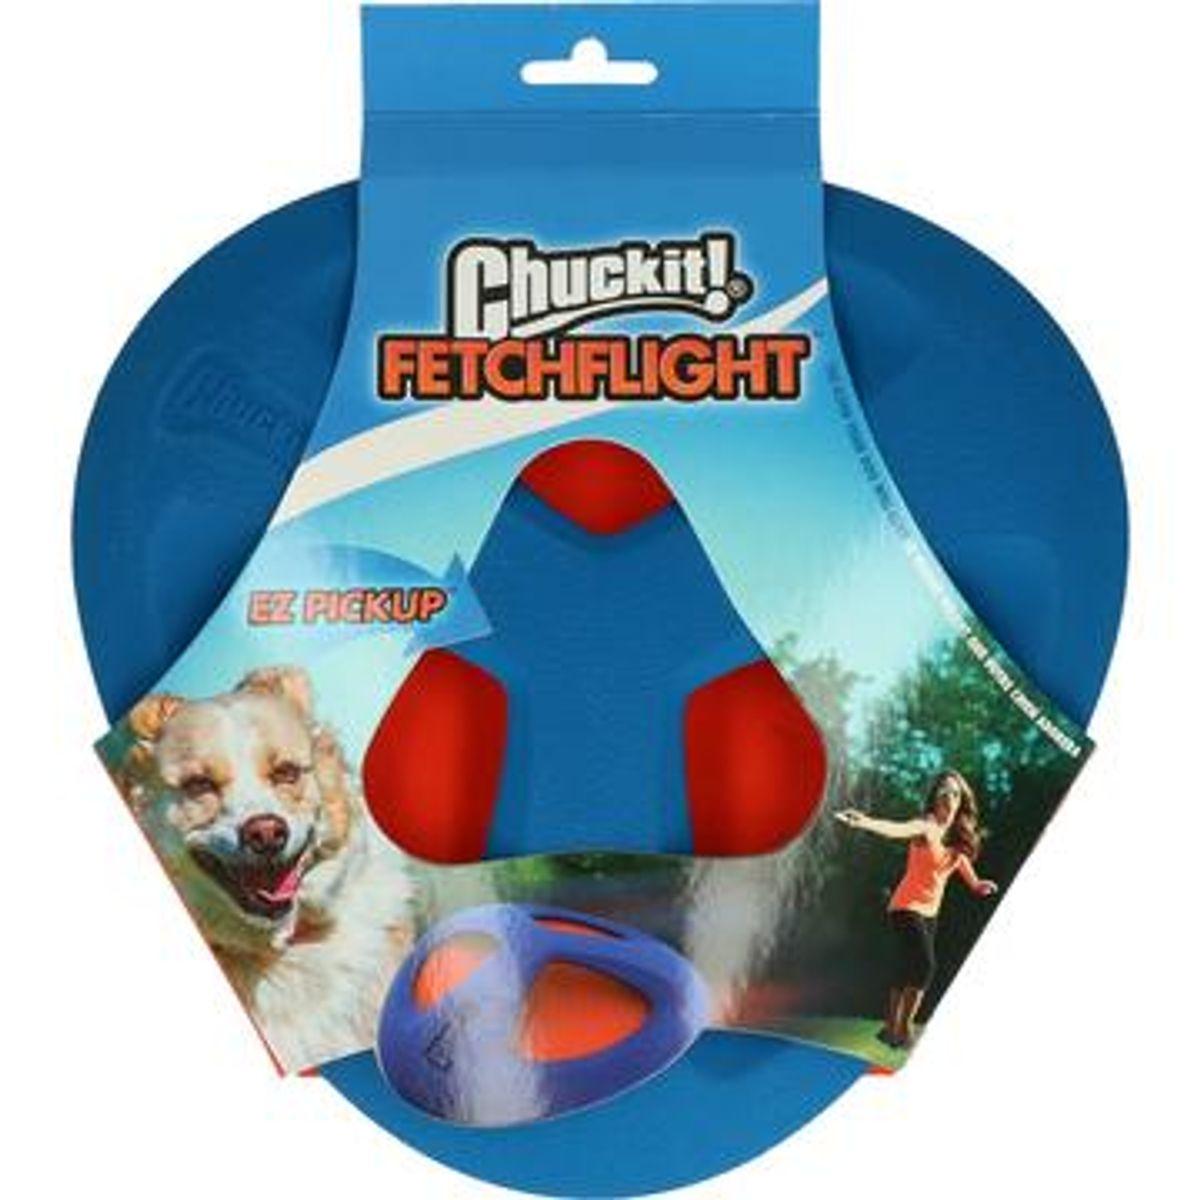 Hundeleke Frisbee Chuckit! Fetchflight